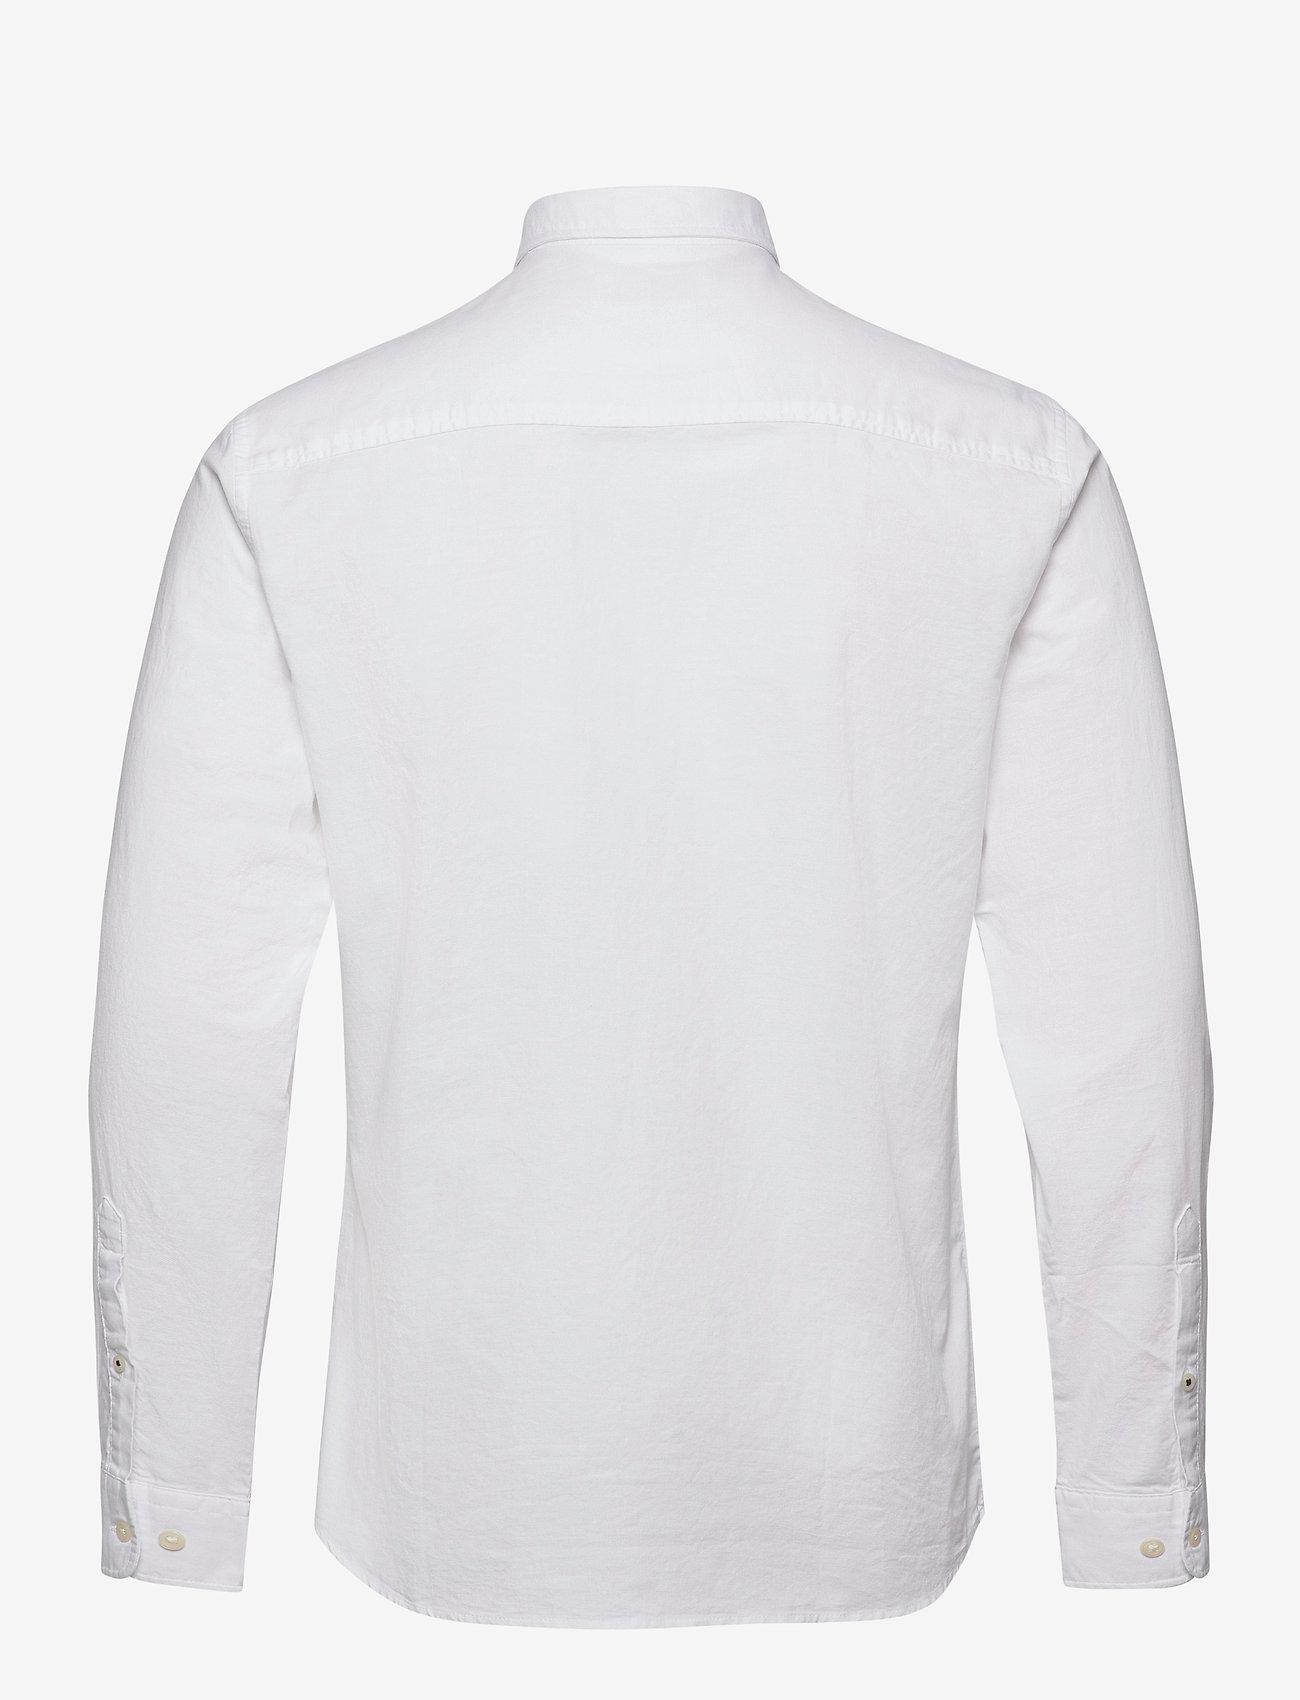 Jack & Jones - JJEOXFORD SHIRT L/S S21 - casual skjortor - white - 1